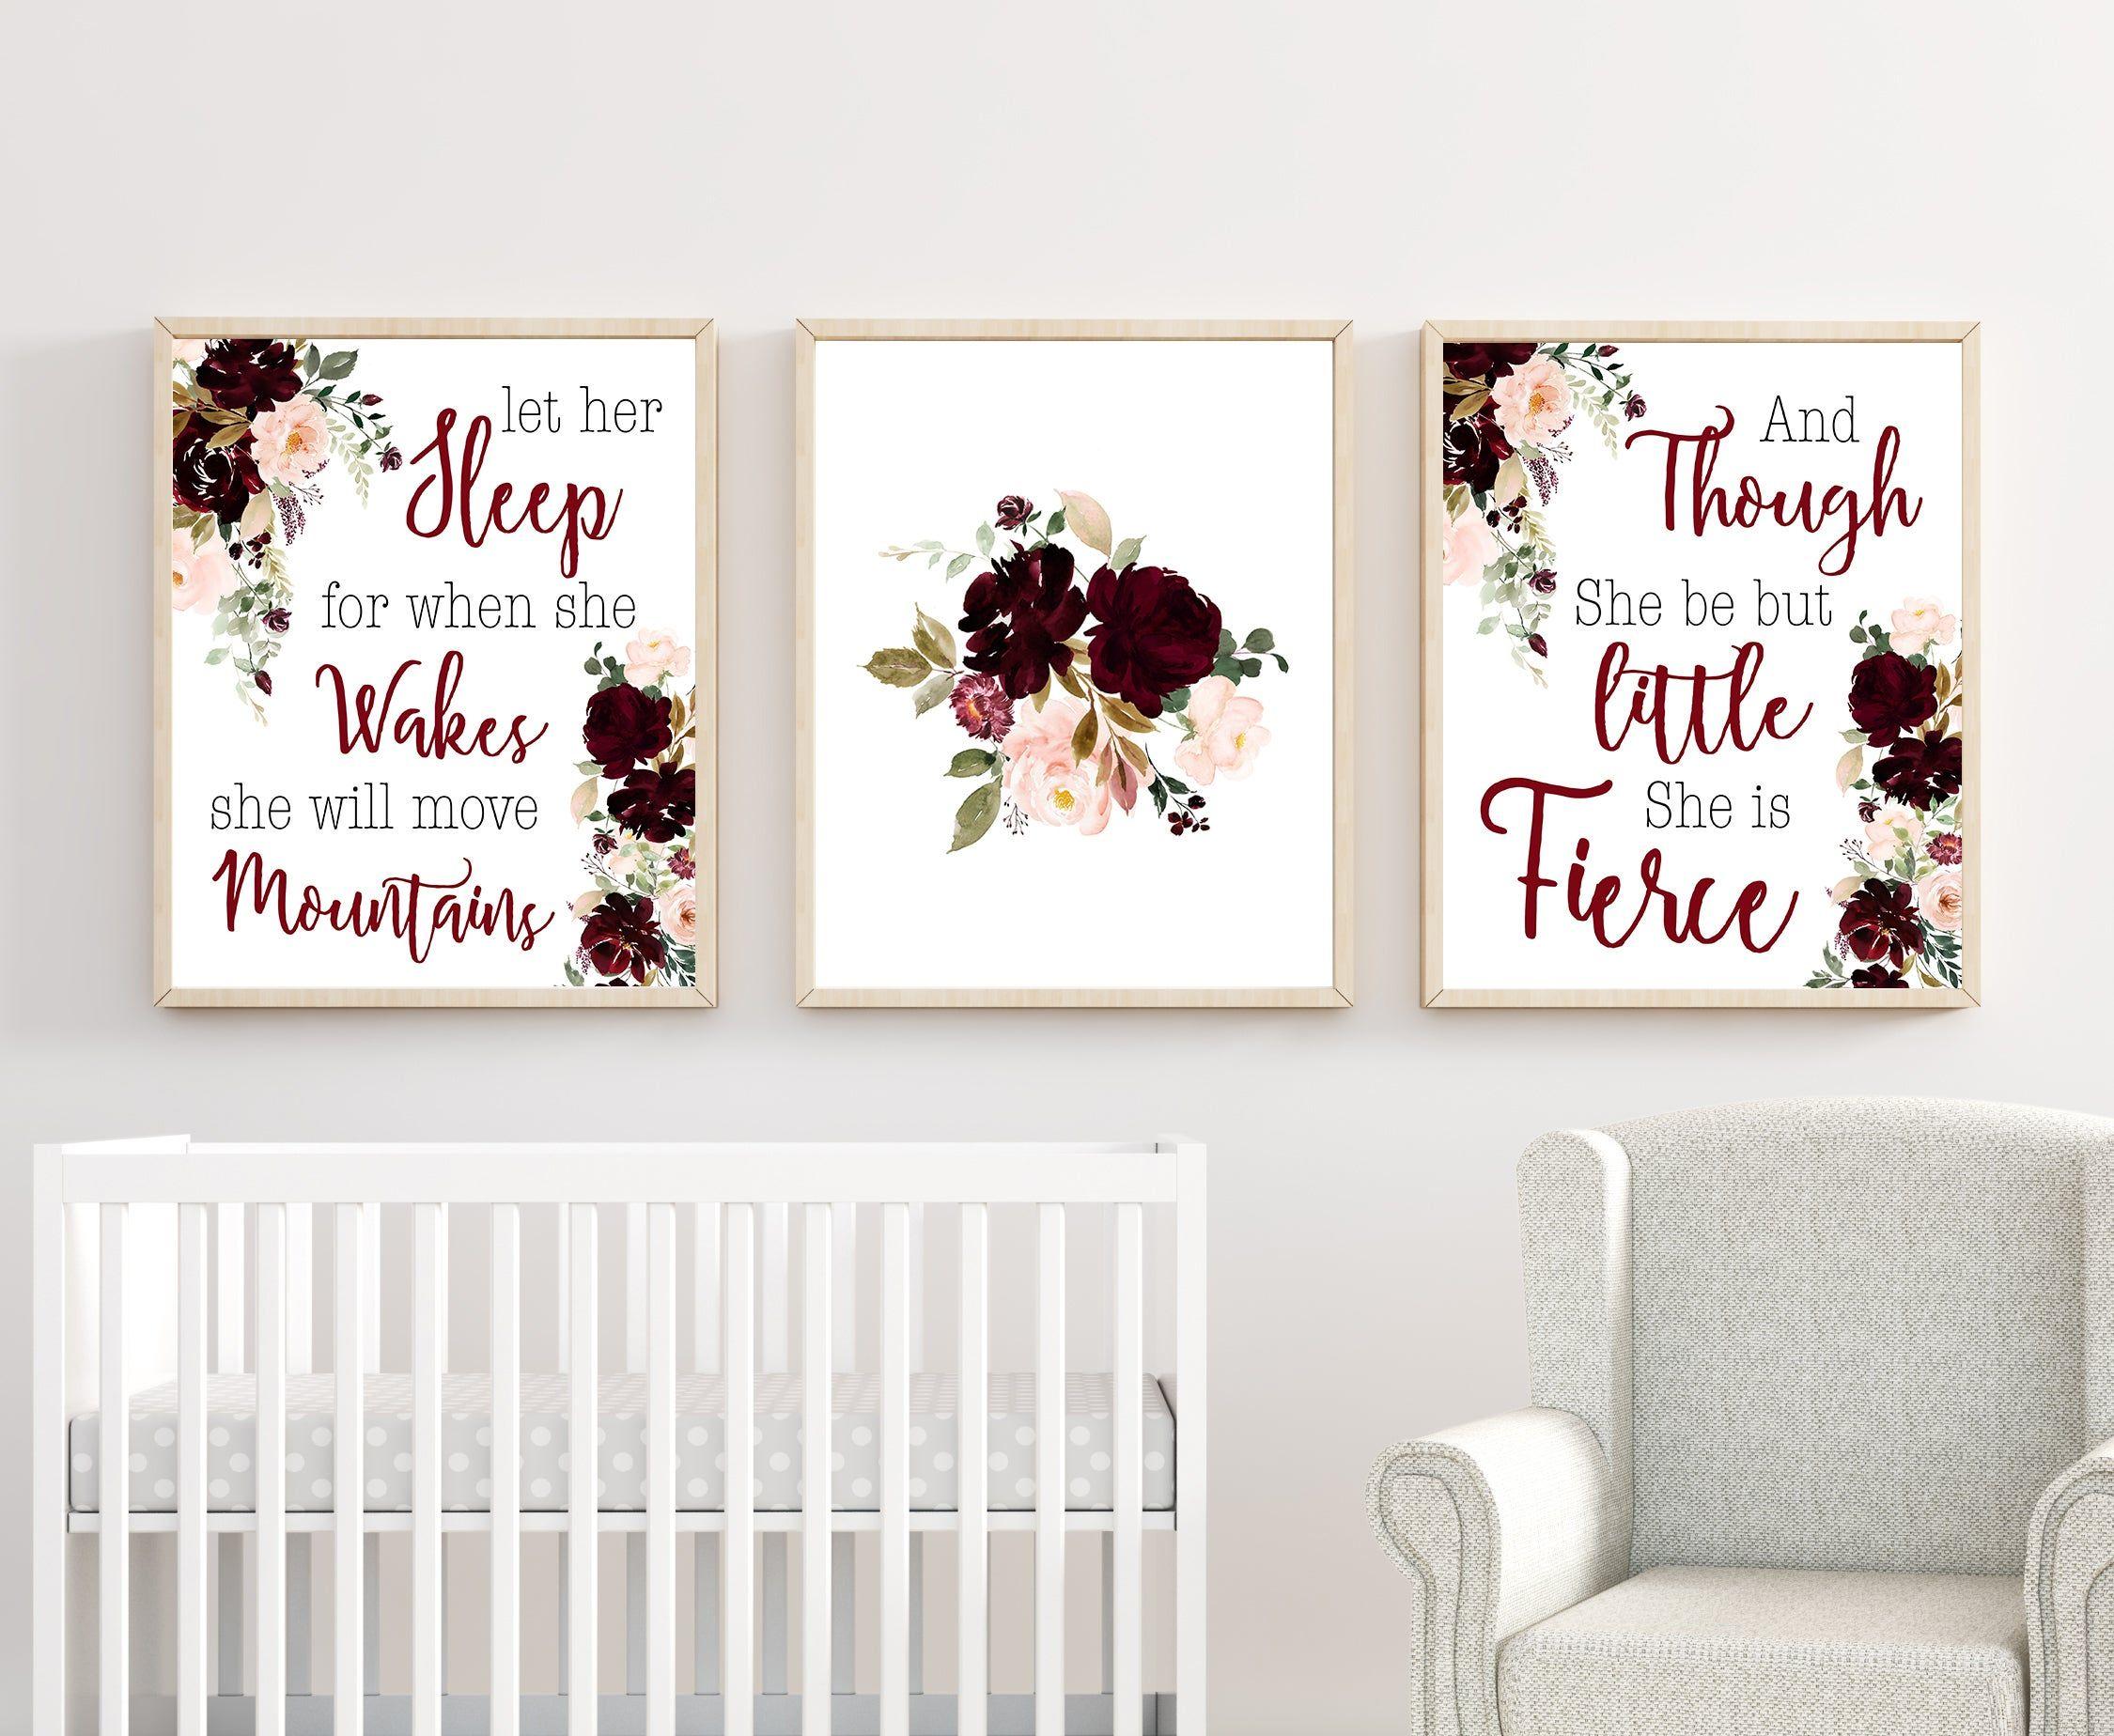 Floral Nursery Decor Baby Room Wall Art Nursery Decor Girl Nursery Wall Art Floral Bedroom Art In 2020 Floral